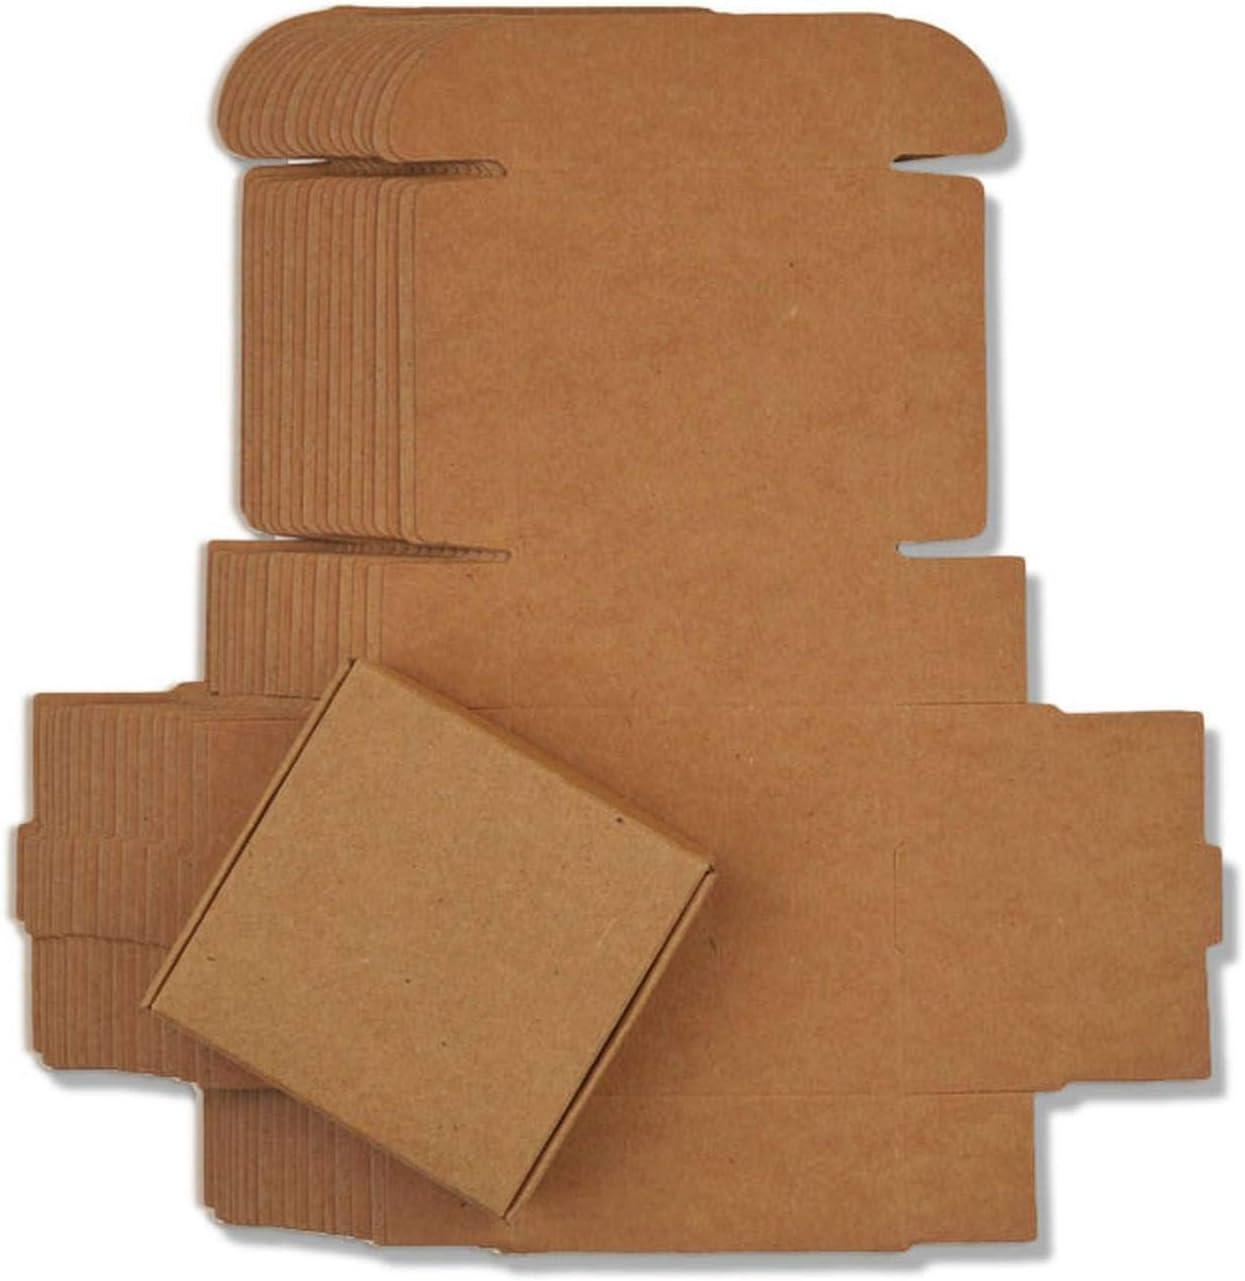 10pcs / Lot 12sizes Cuadro pequeño Papel Kraft, cartón Caja de jabón Hecho a Mano de Color marrón, Caja de Regalo de Papel del Arte Blanco, Negro joyero Embalaje, Papel Kraft, 5.5x5.5x2.5cm: